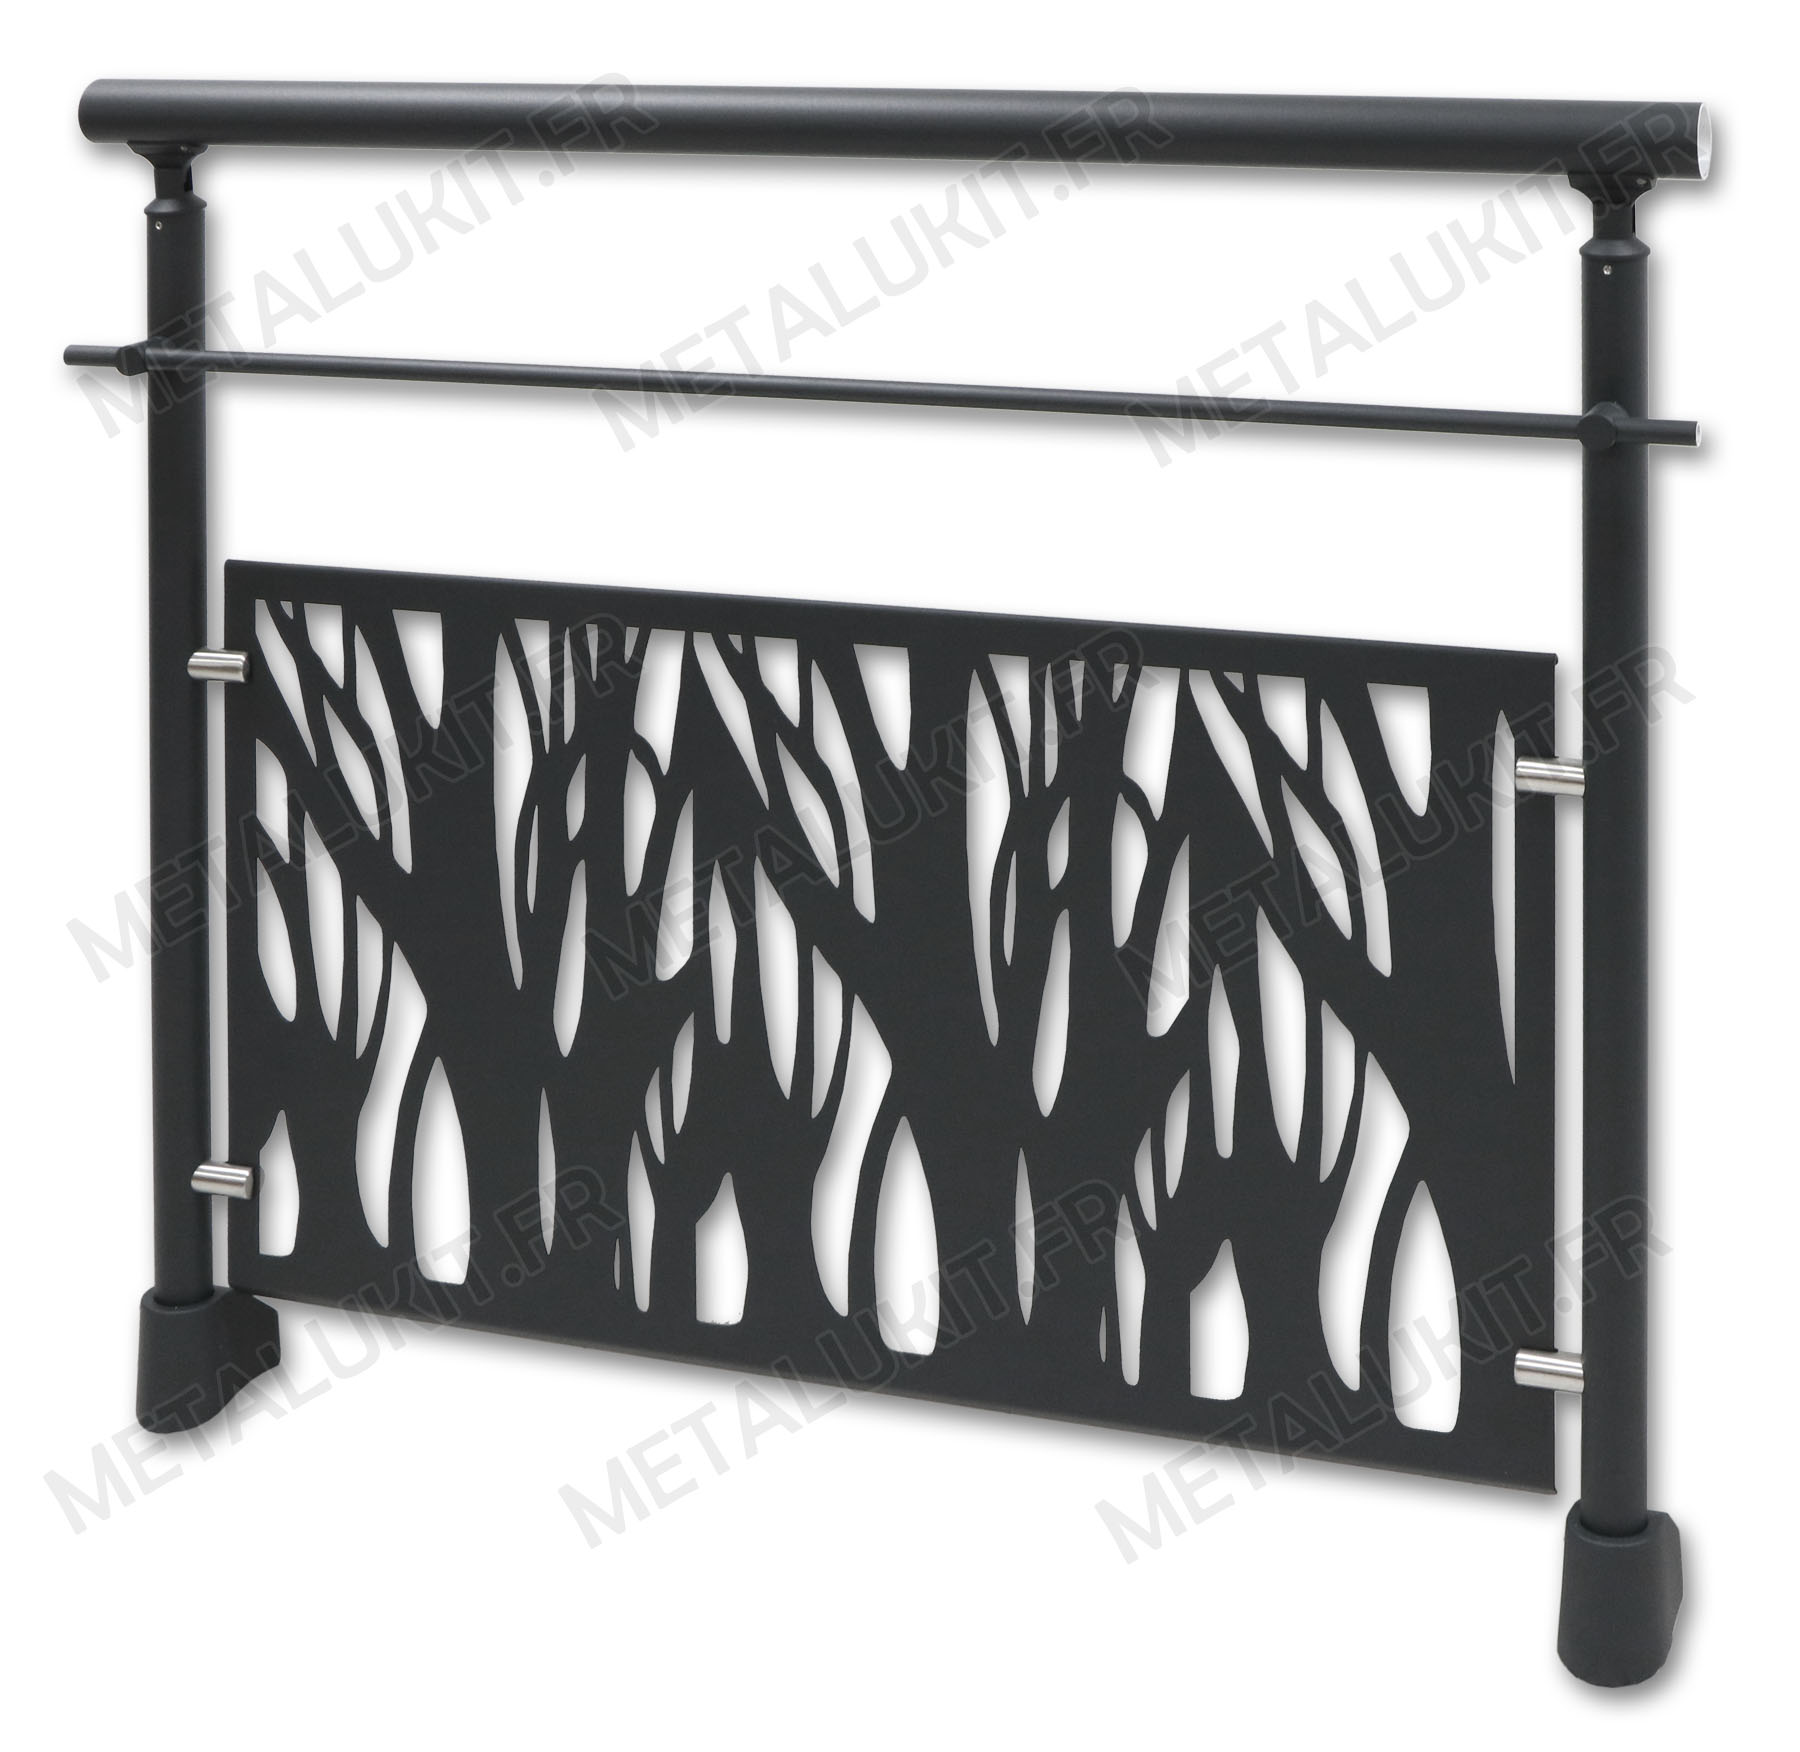 garde corps gris anthracite avec t le perfor e en alu et en kit sol. Black Bedroom Furniture Sets. Home Design Ideas